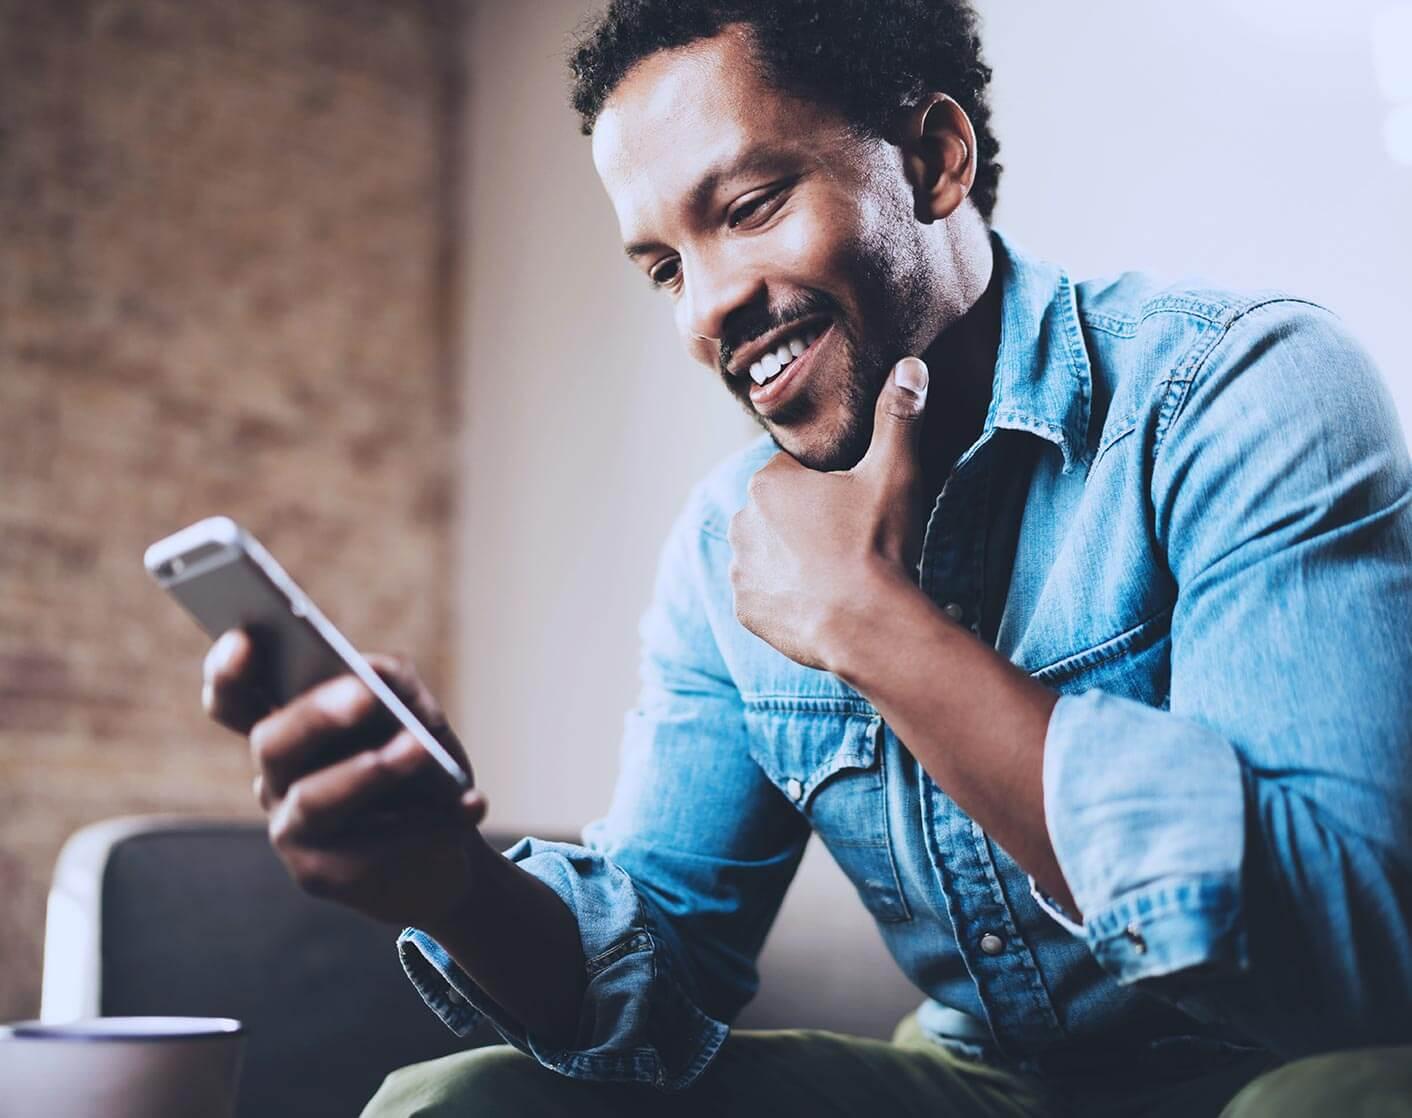 close up shot of black man sitting down wearing jean shirt looking at smart phone